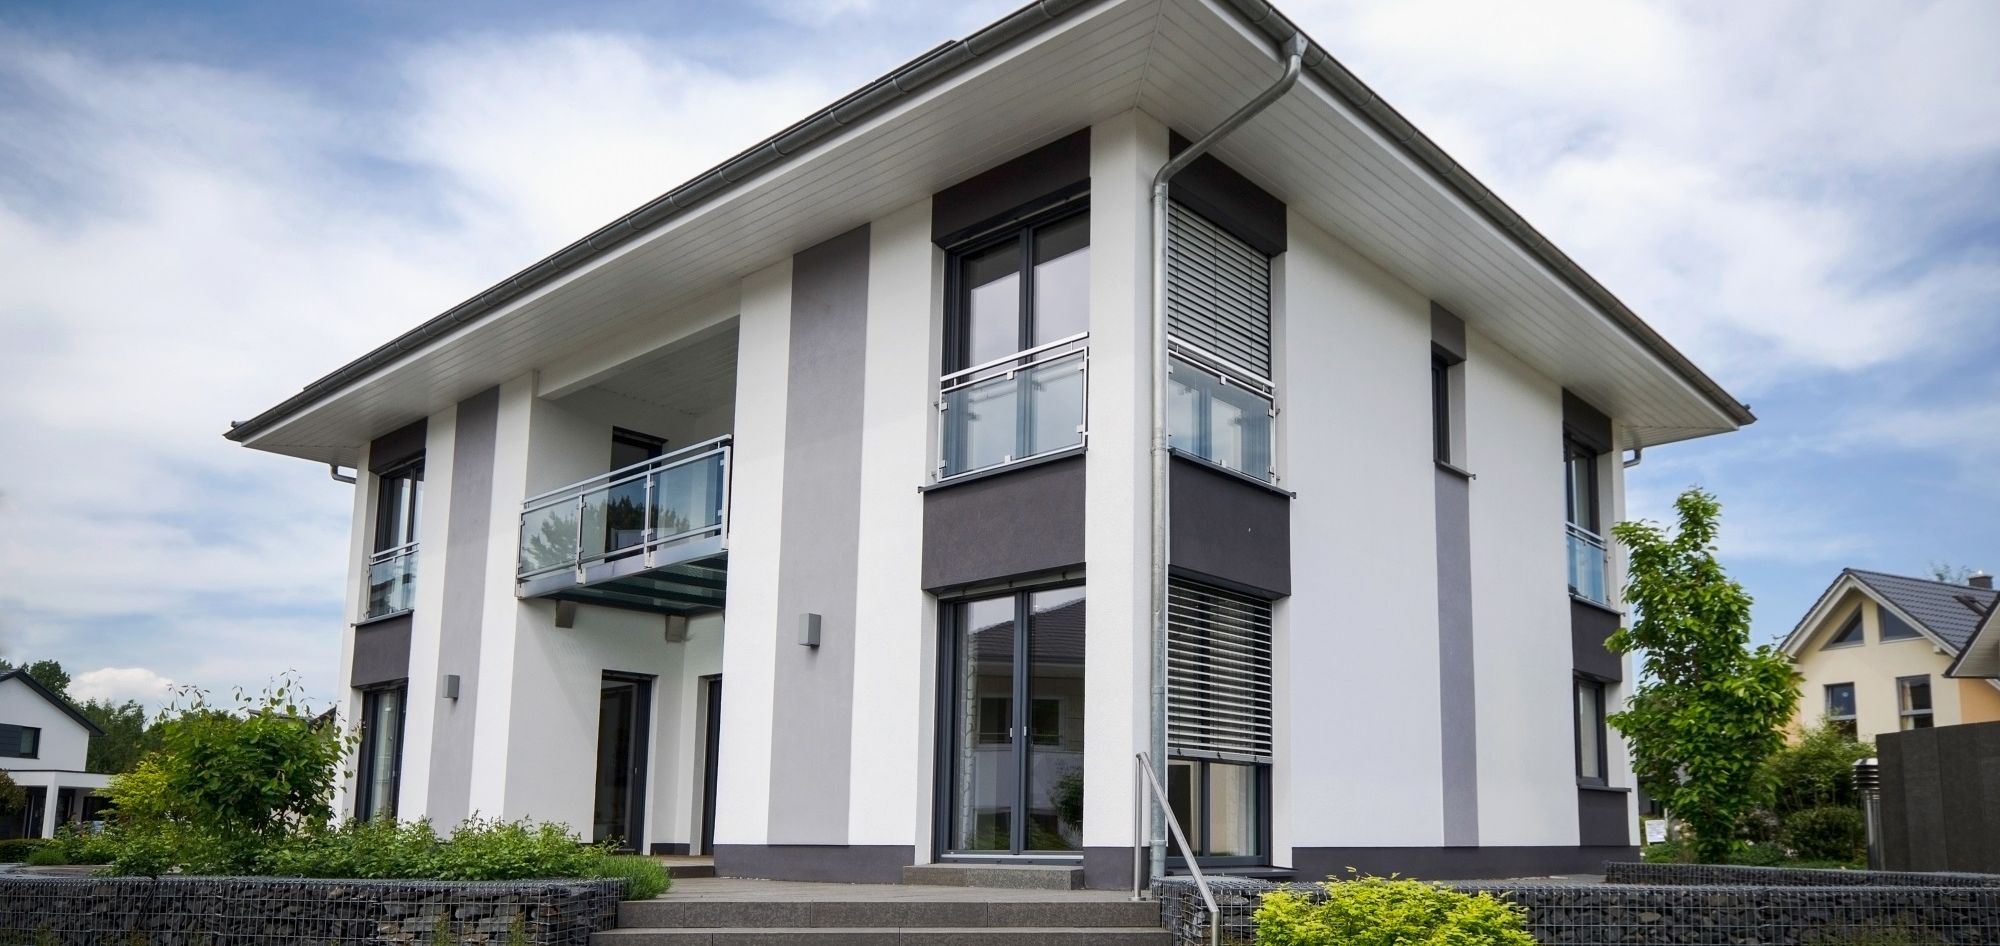 Haus Neubau - Baufirma Wien